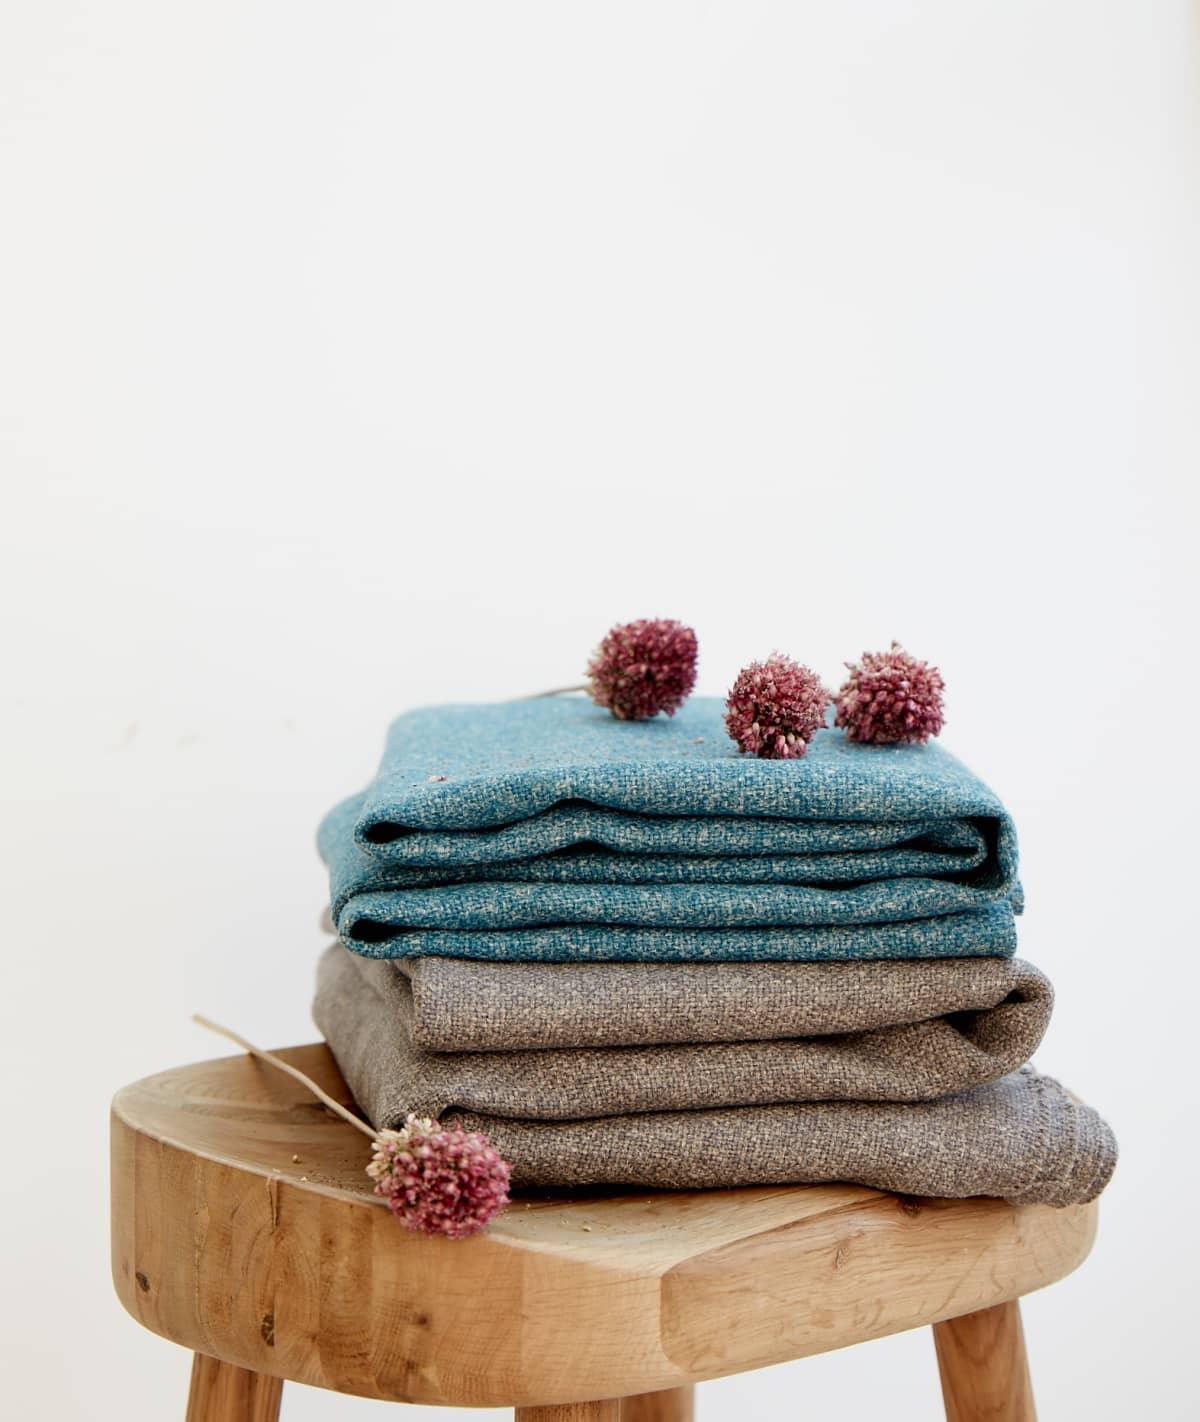 Stitched Jute Green Brown & Water Blue Hemp SustainableCurtains